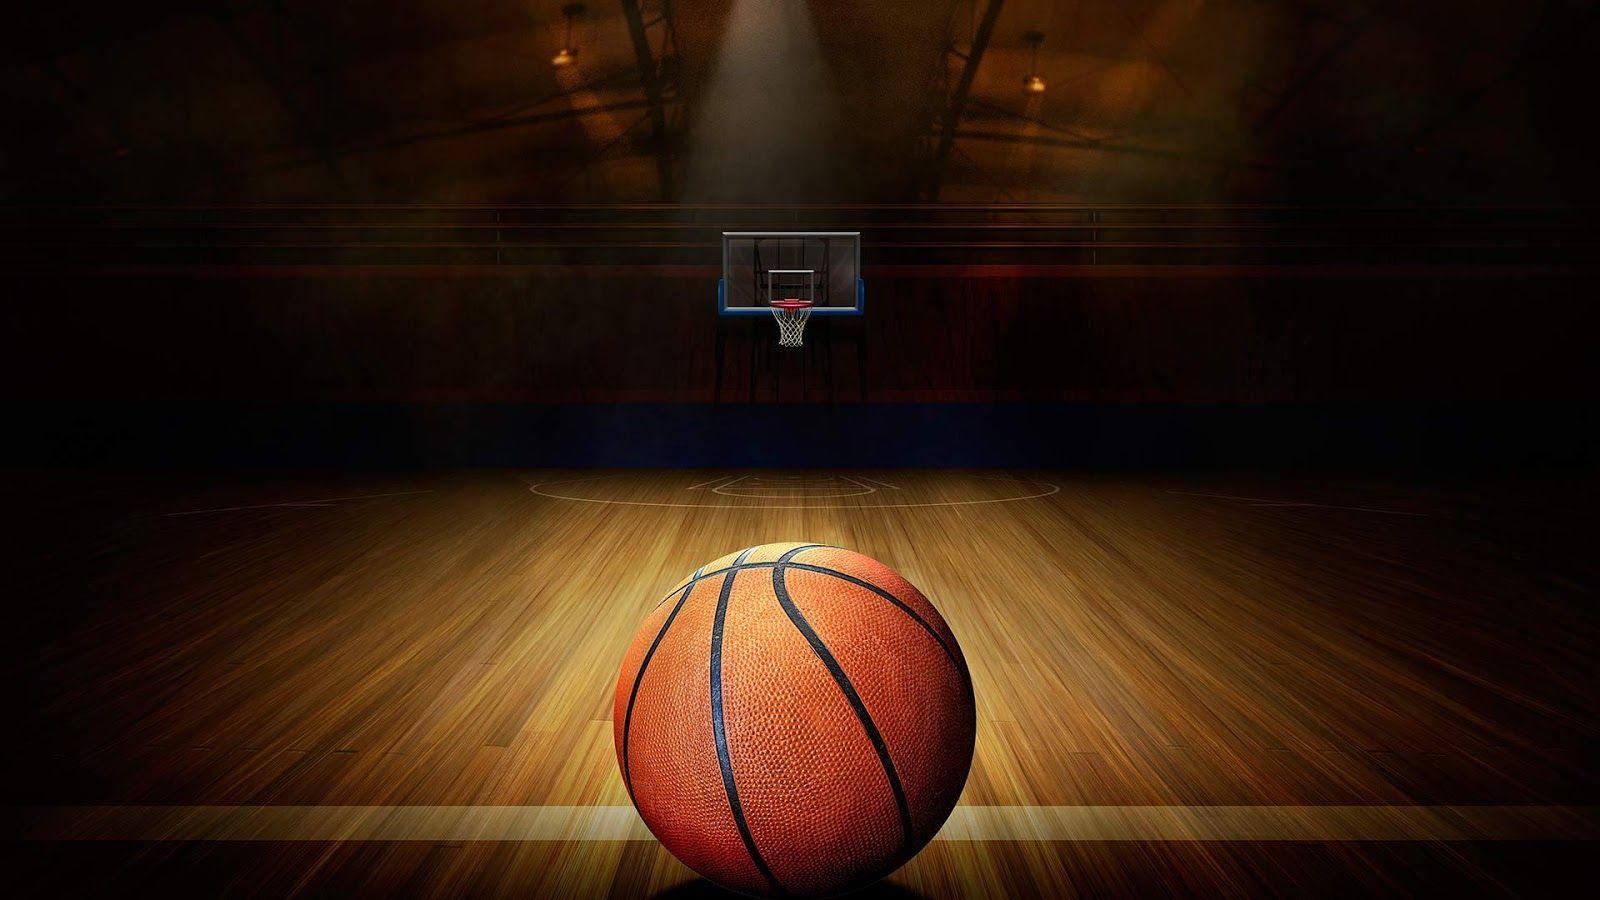 площадка баскетбольная